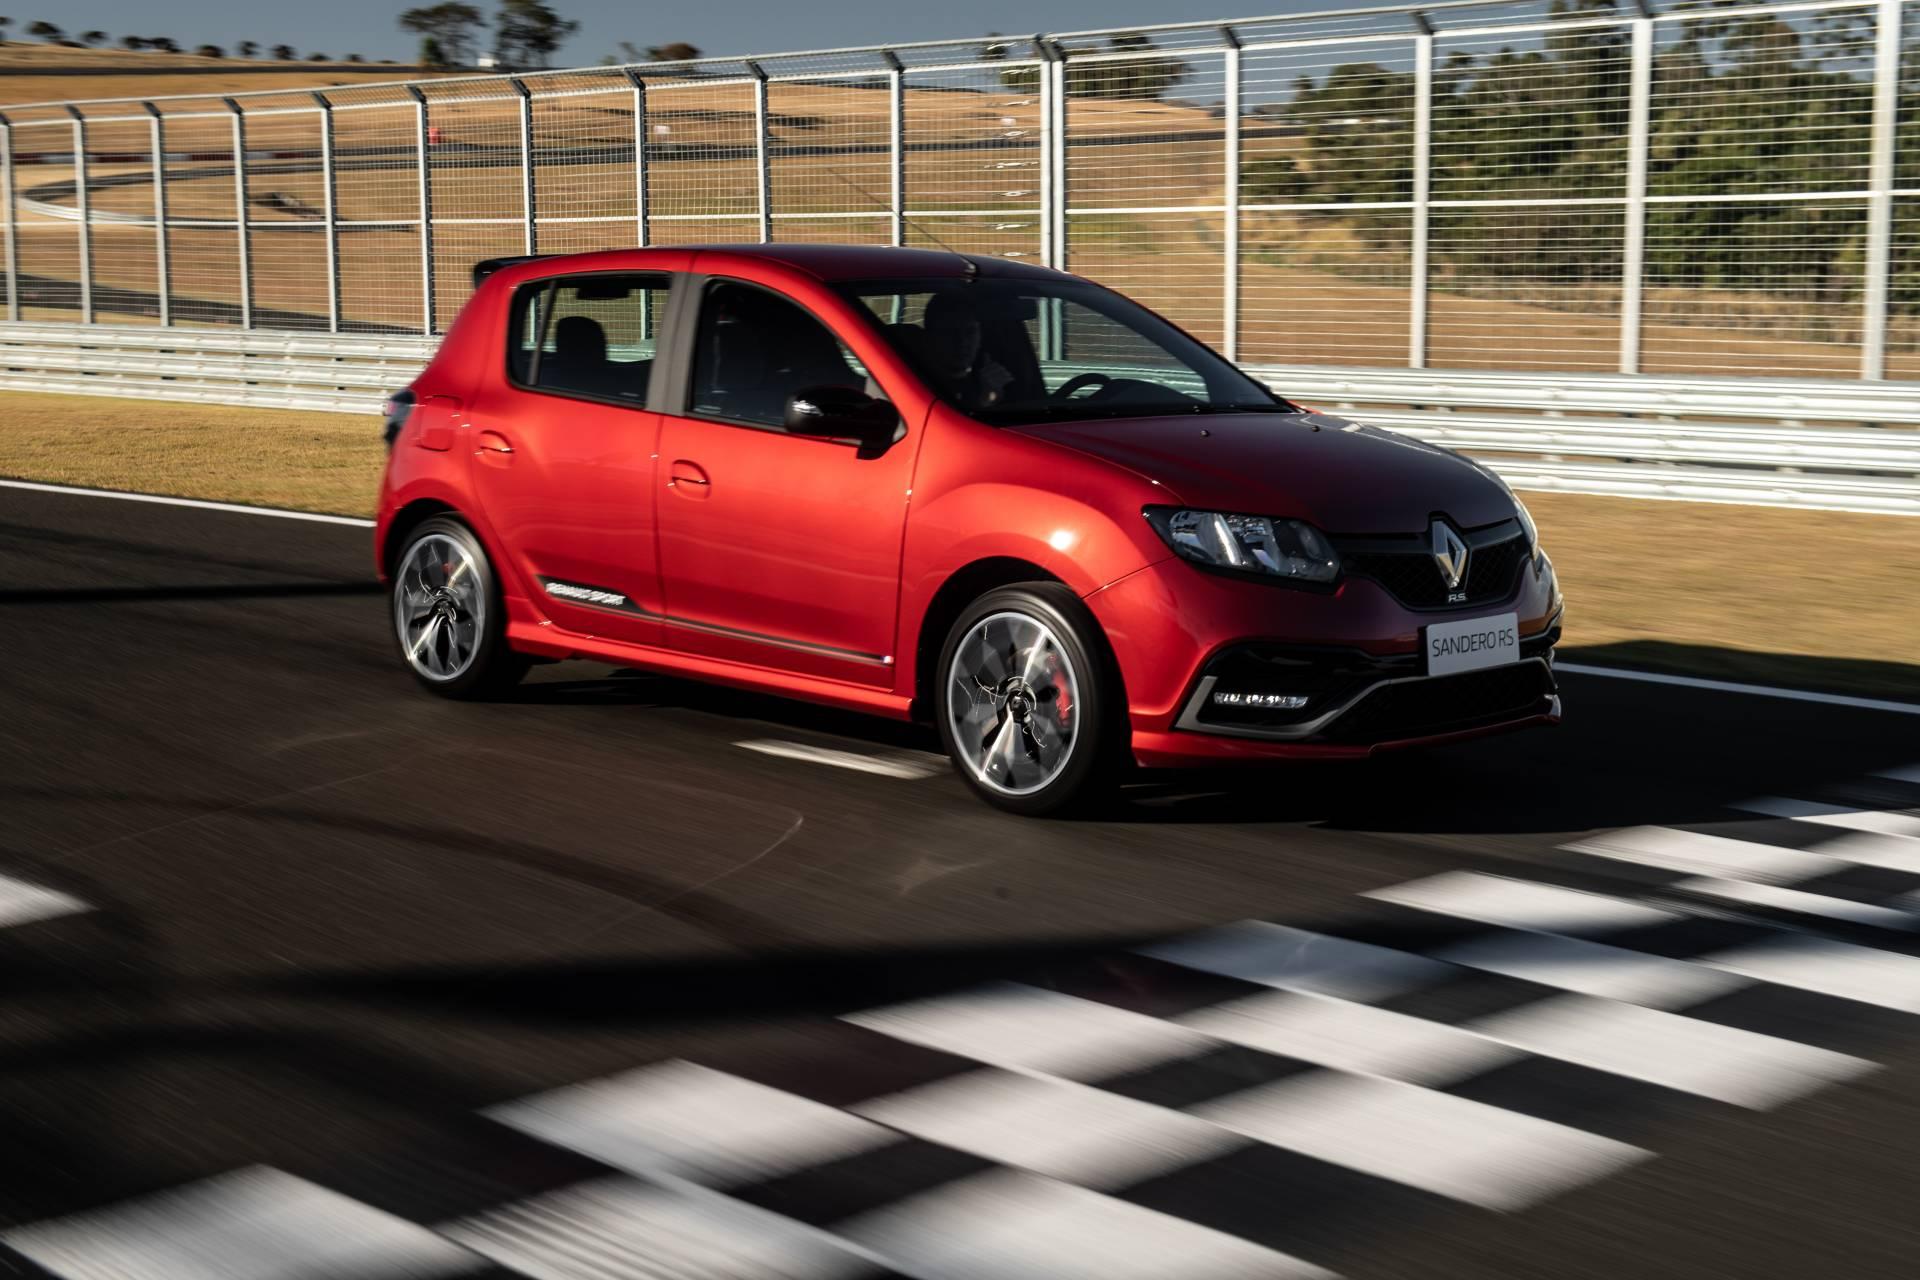 2020_Renault_Sandero_RS_facelift_0022